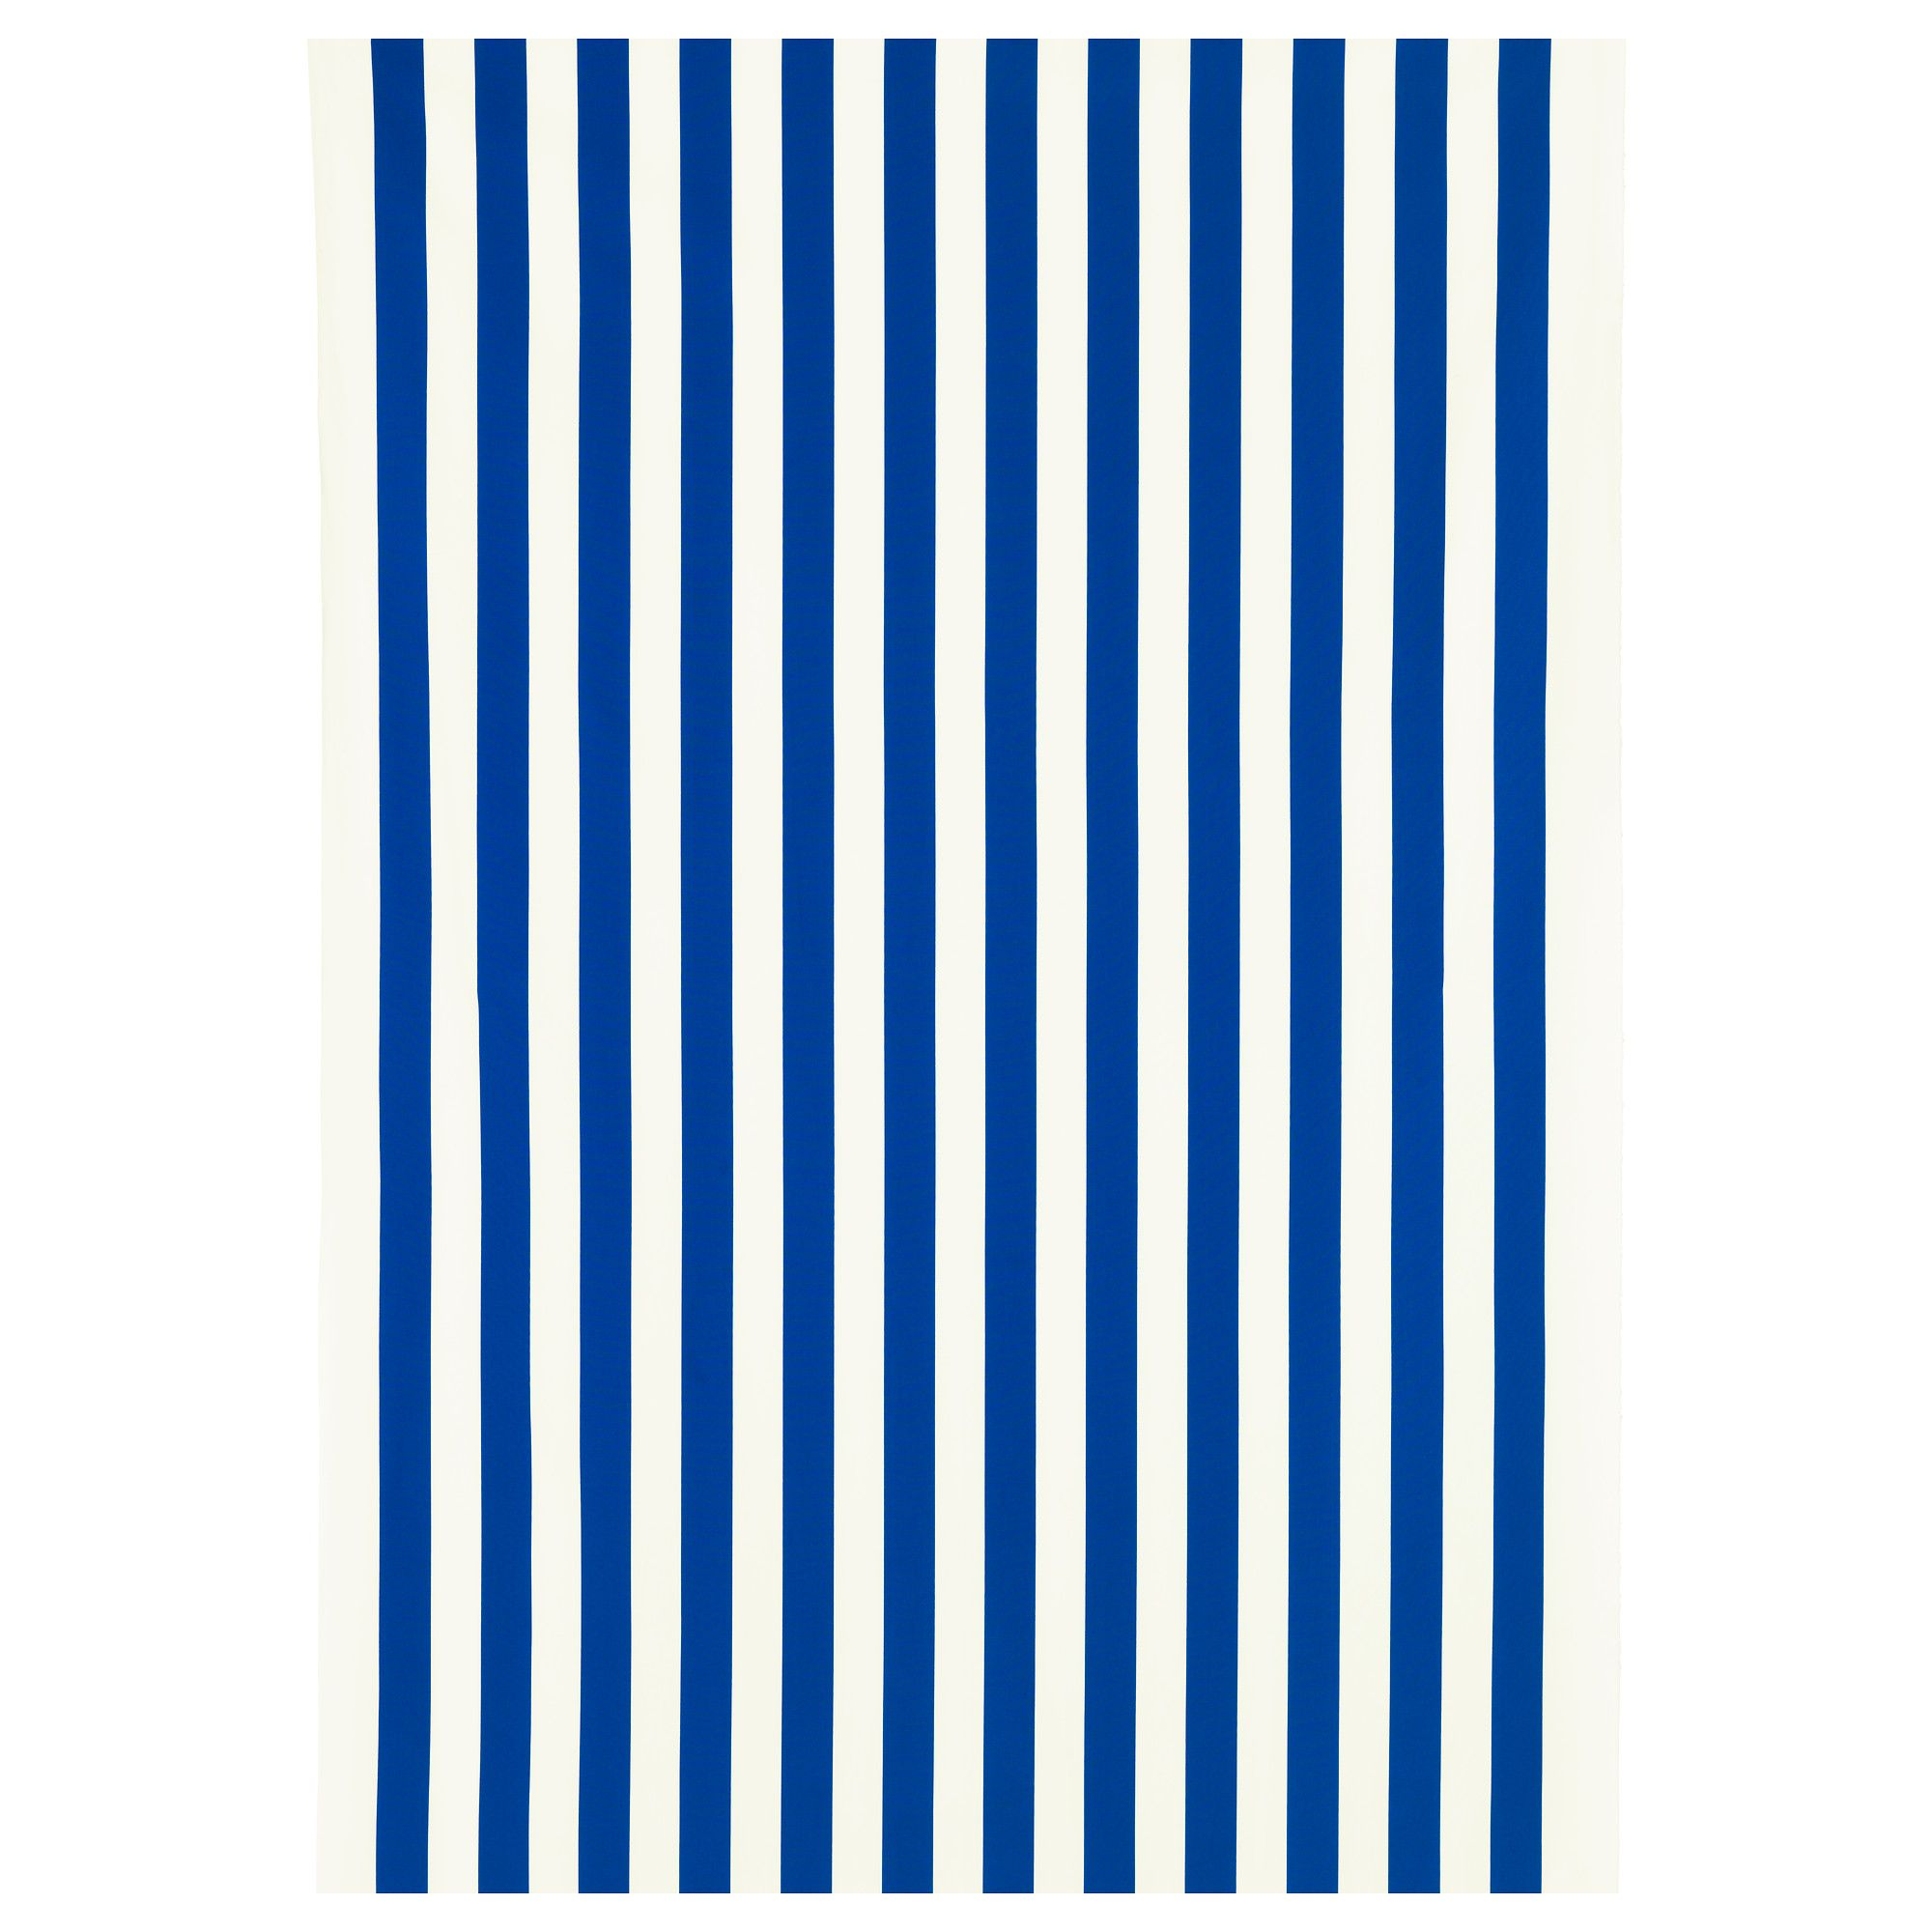 SOFIA Fabric - IKEA Fabric for dog beds Fabric, wide stripe, bright ...